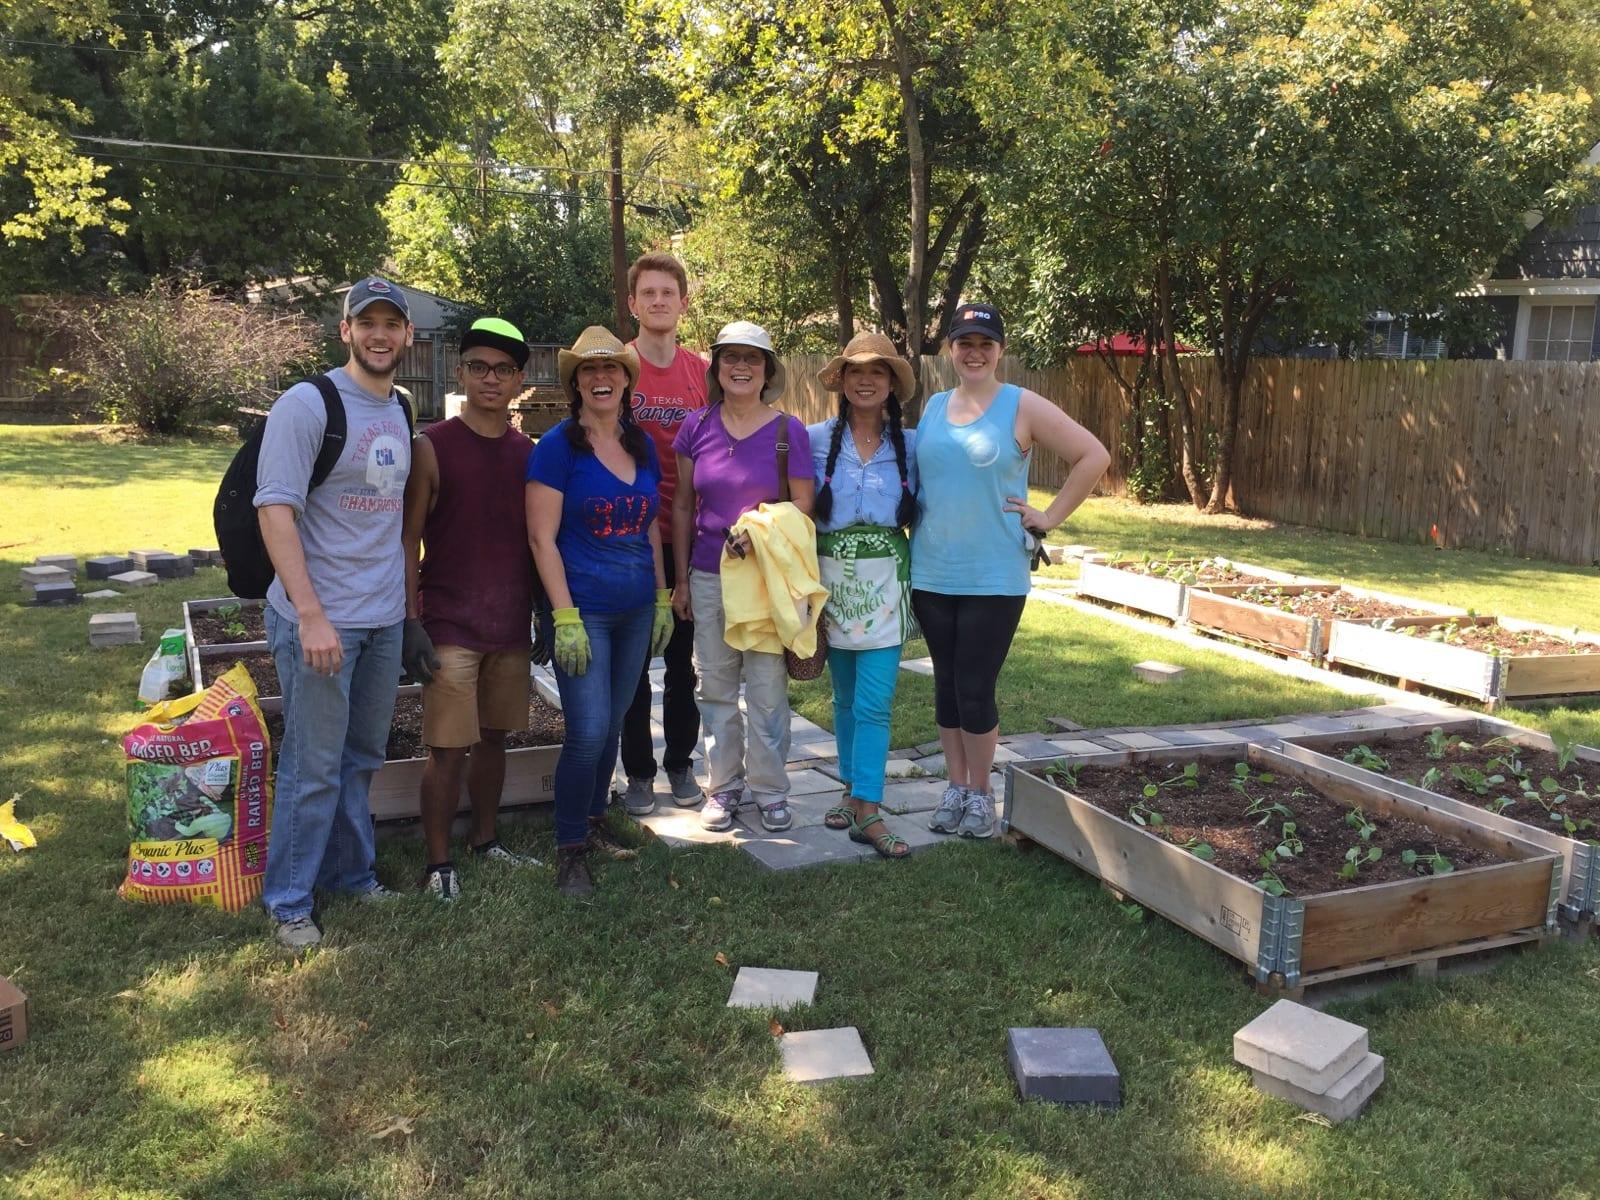 SMU community garden. Perkins school of theology. Volunteers and students. Vegetables and seedlings. Food deserts.